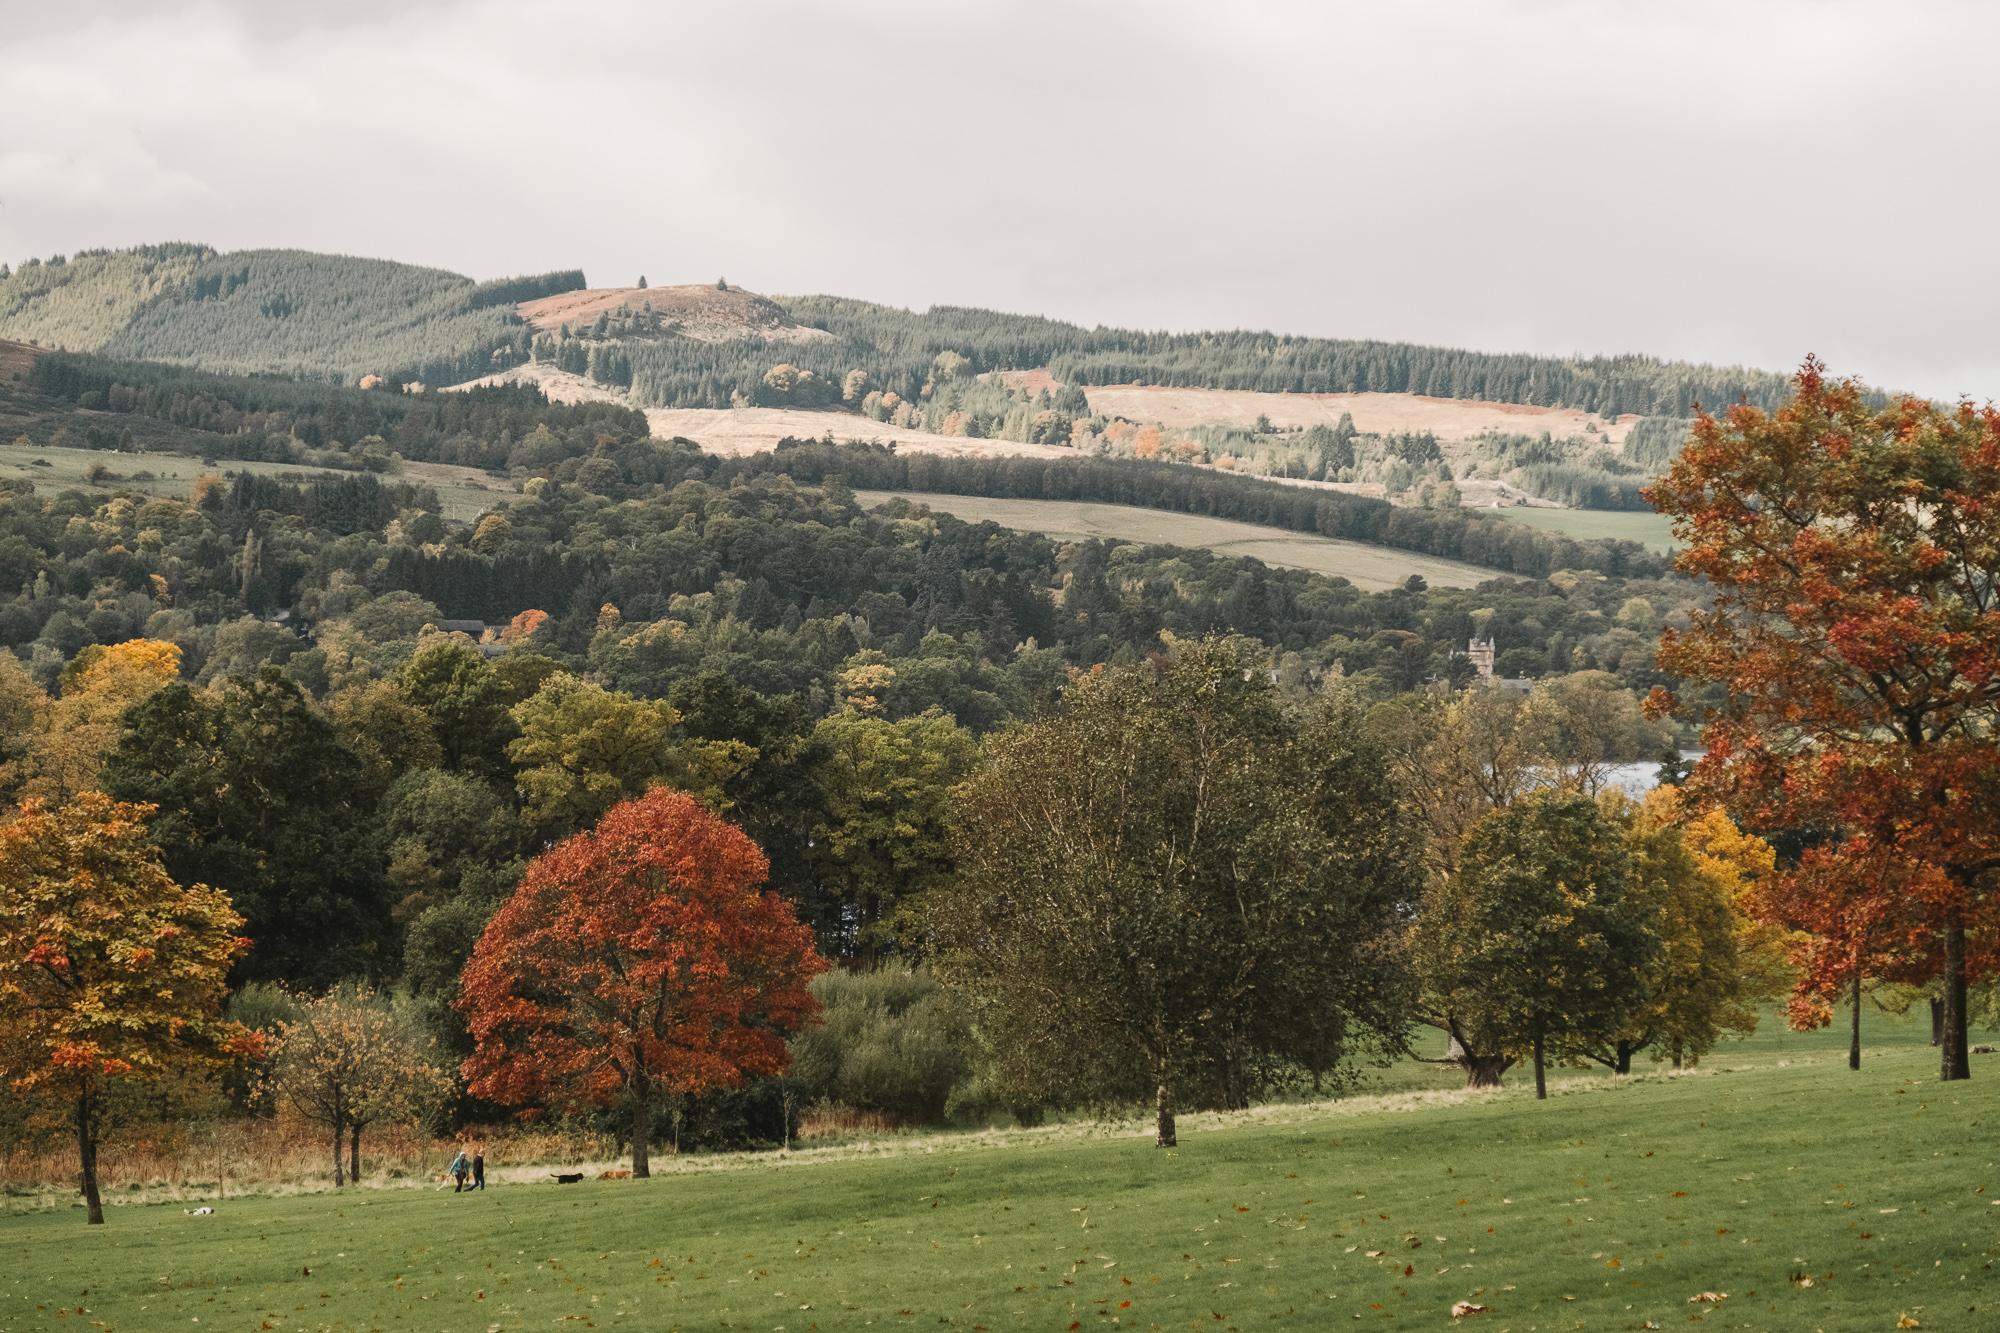 Views over the hills along Loch Lomond